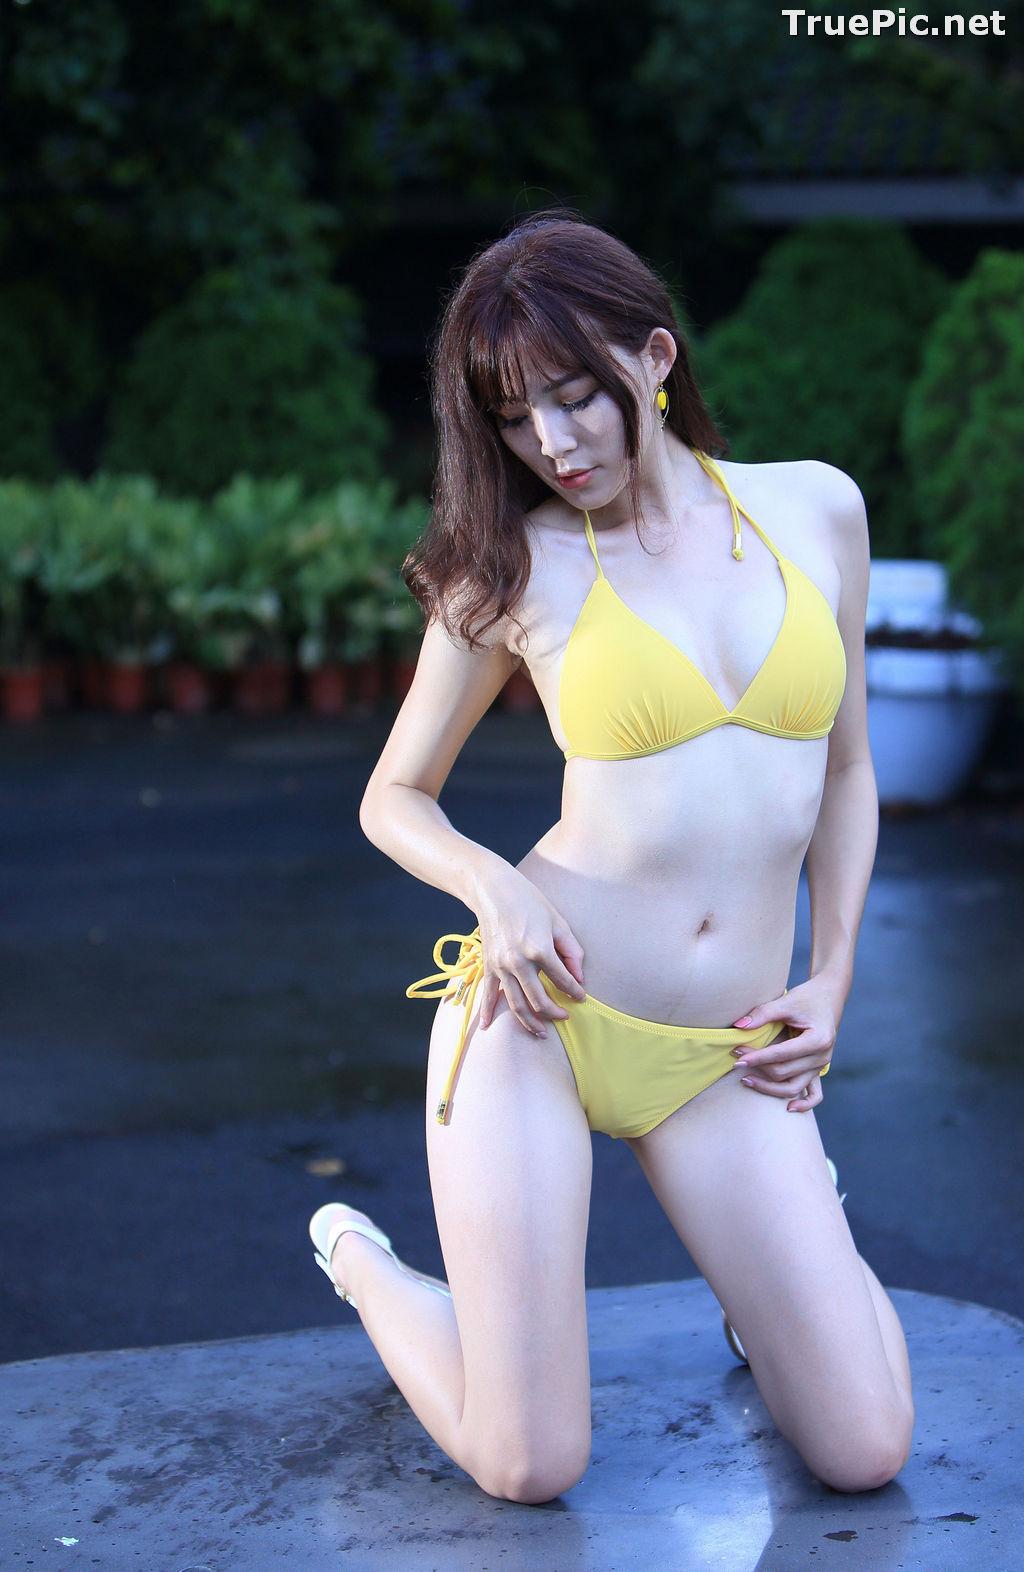 Image Taiwanese Model - Ash Ley - Yellow Bikini at Taipei Water Museum - TruePic.net - Picture-18